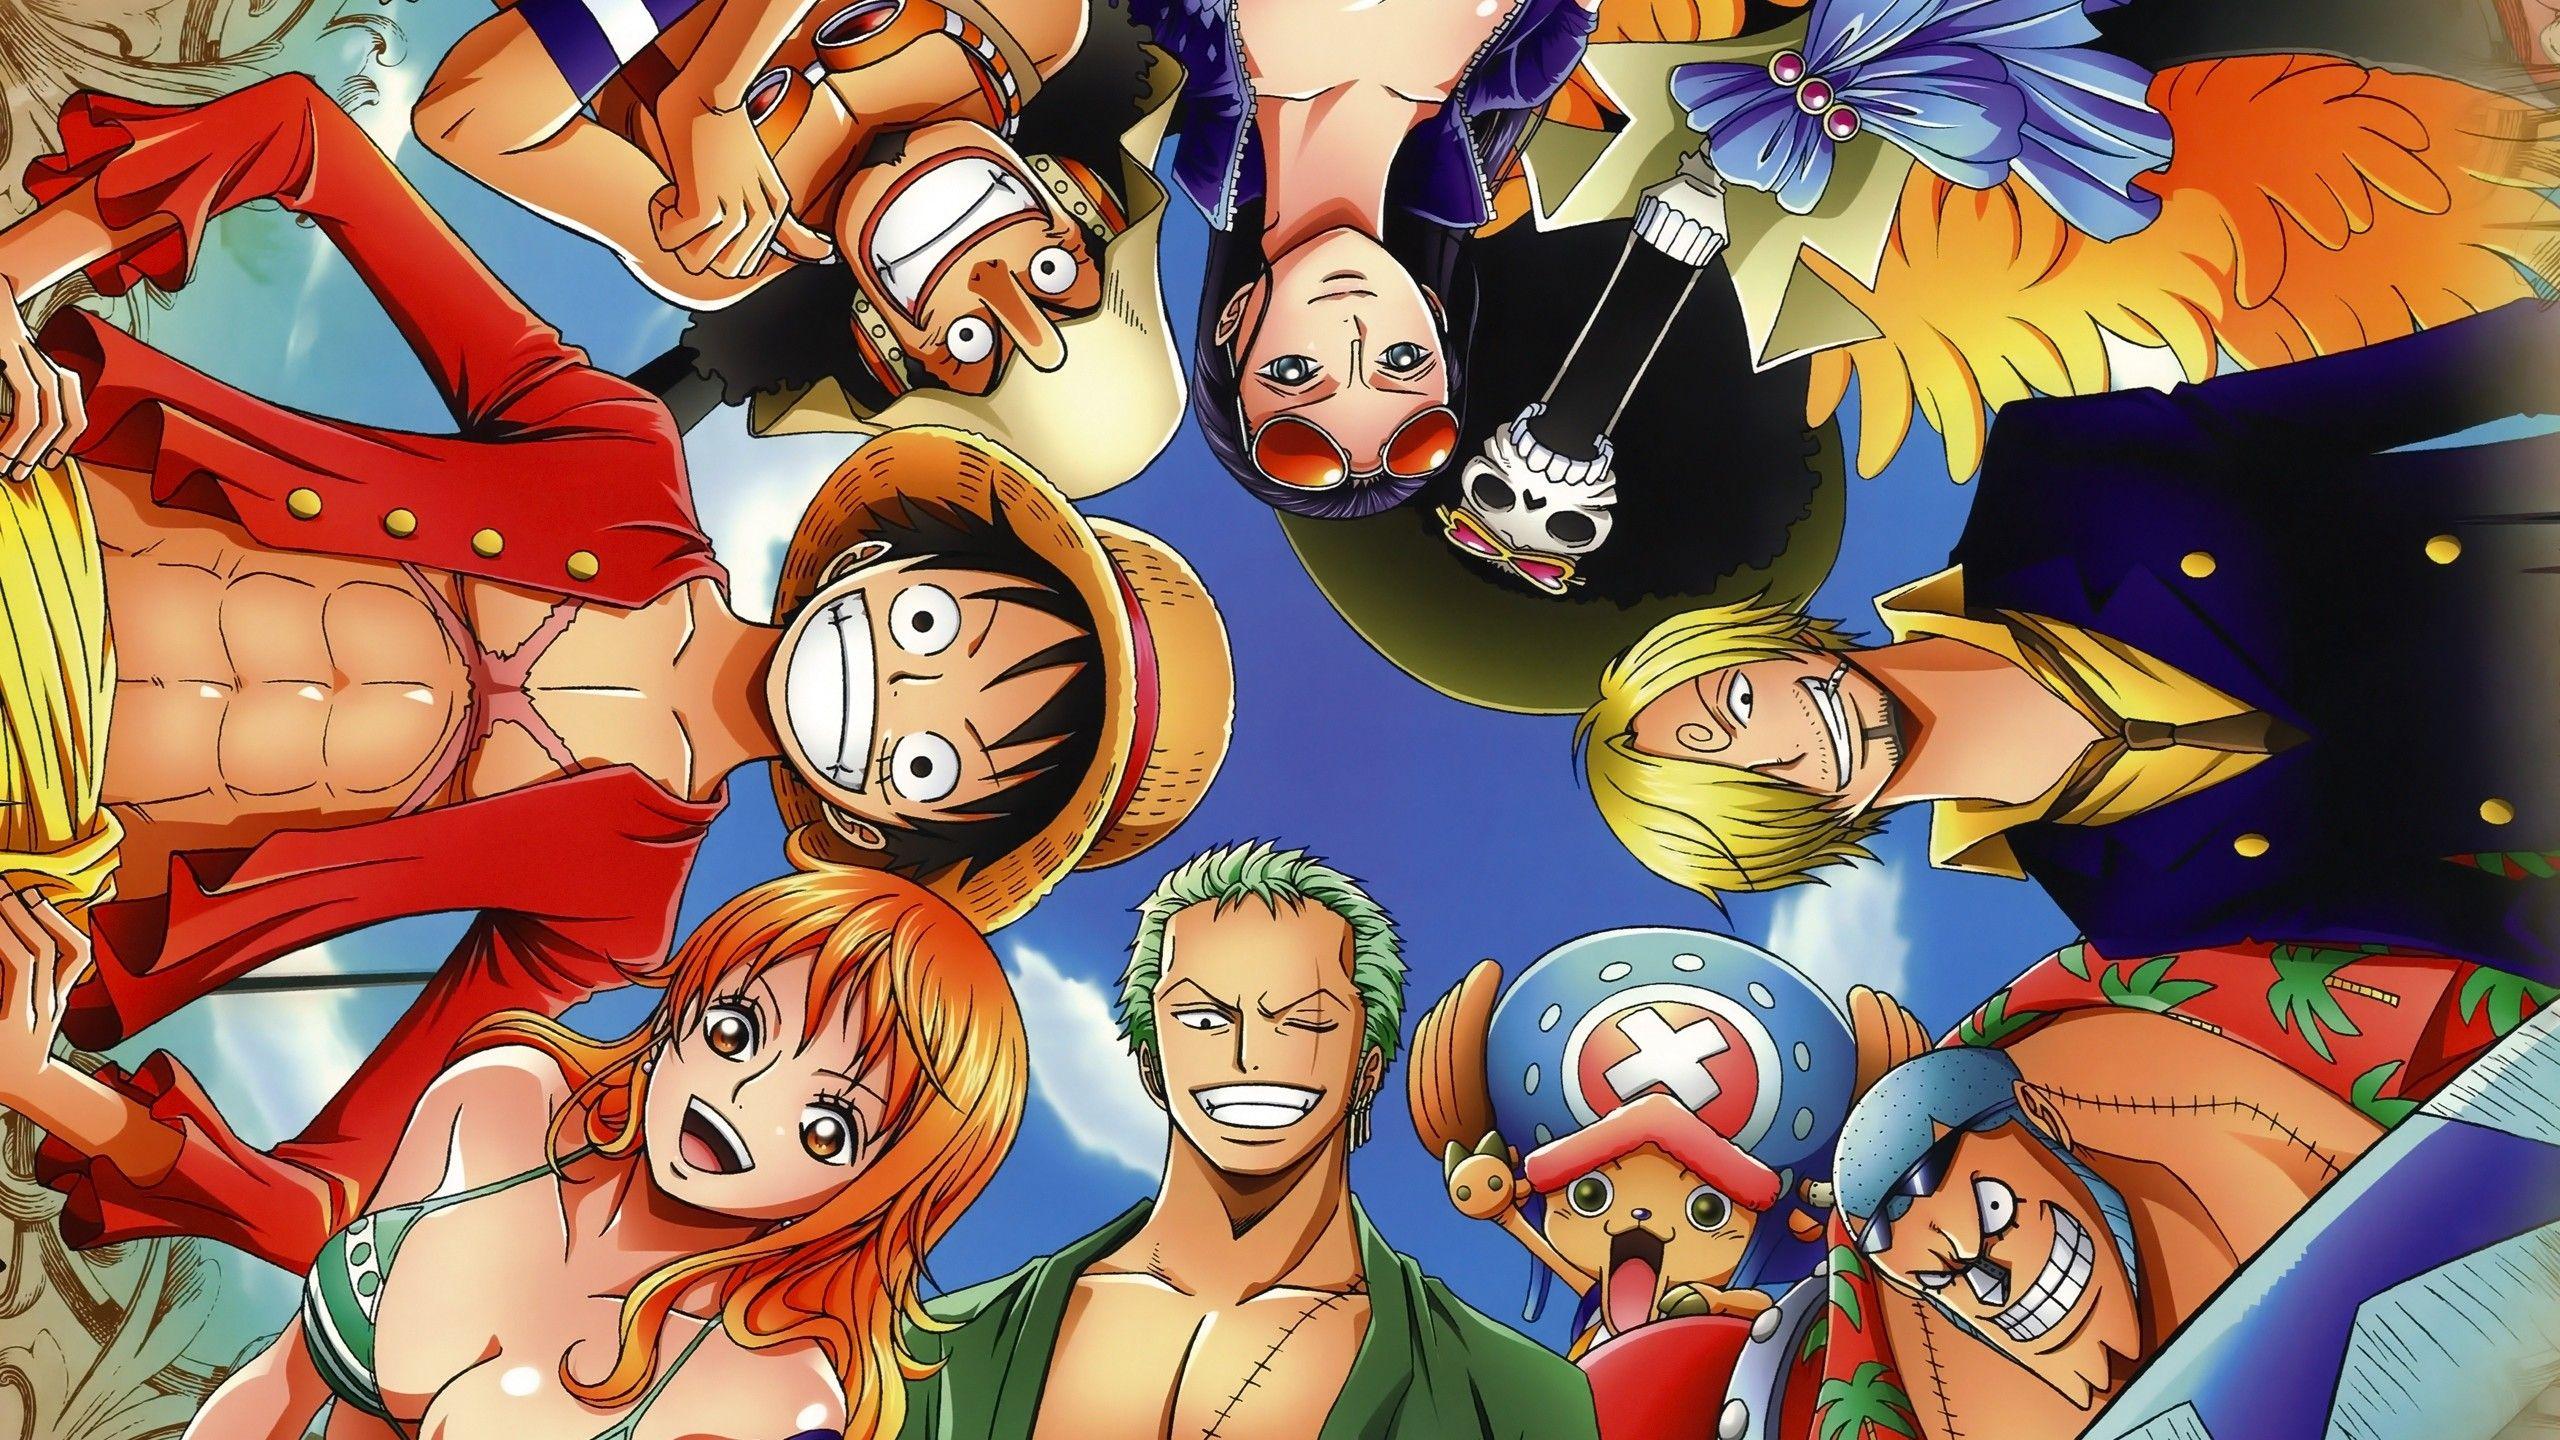 2560x1440 Hd Wallpaper Background Id 606284 Wallpaper Anime Animasi Ilustrasi